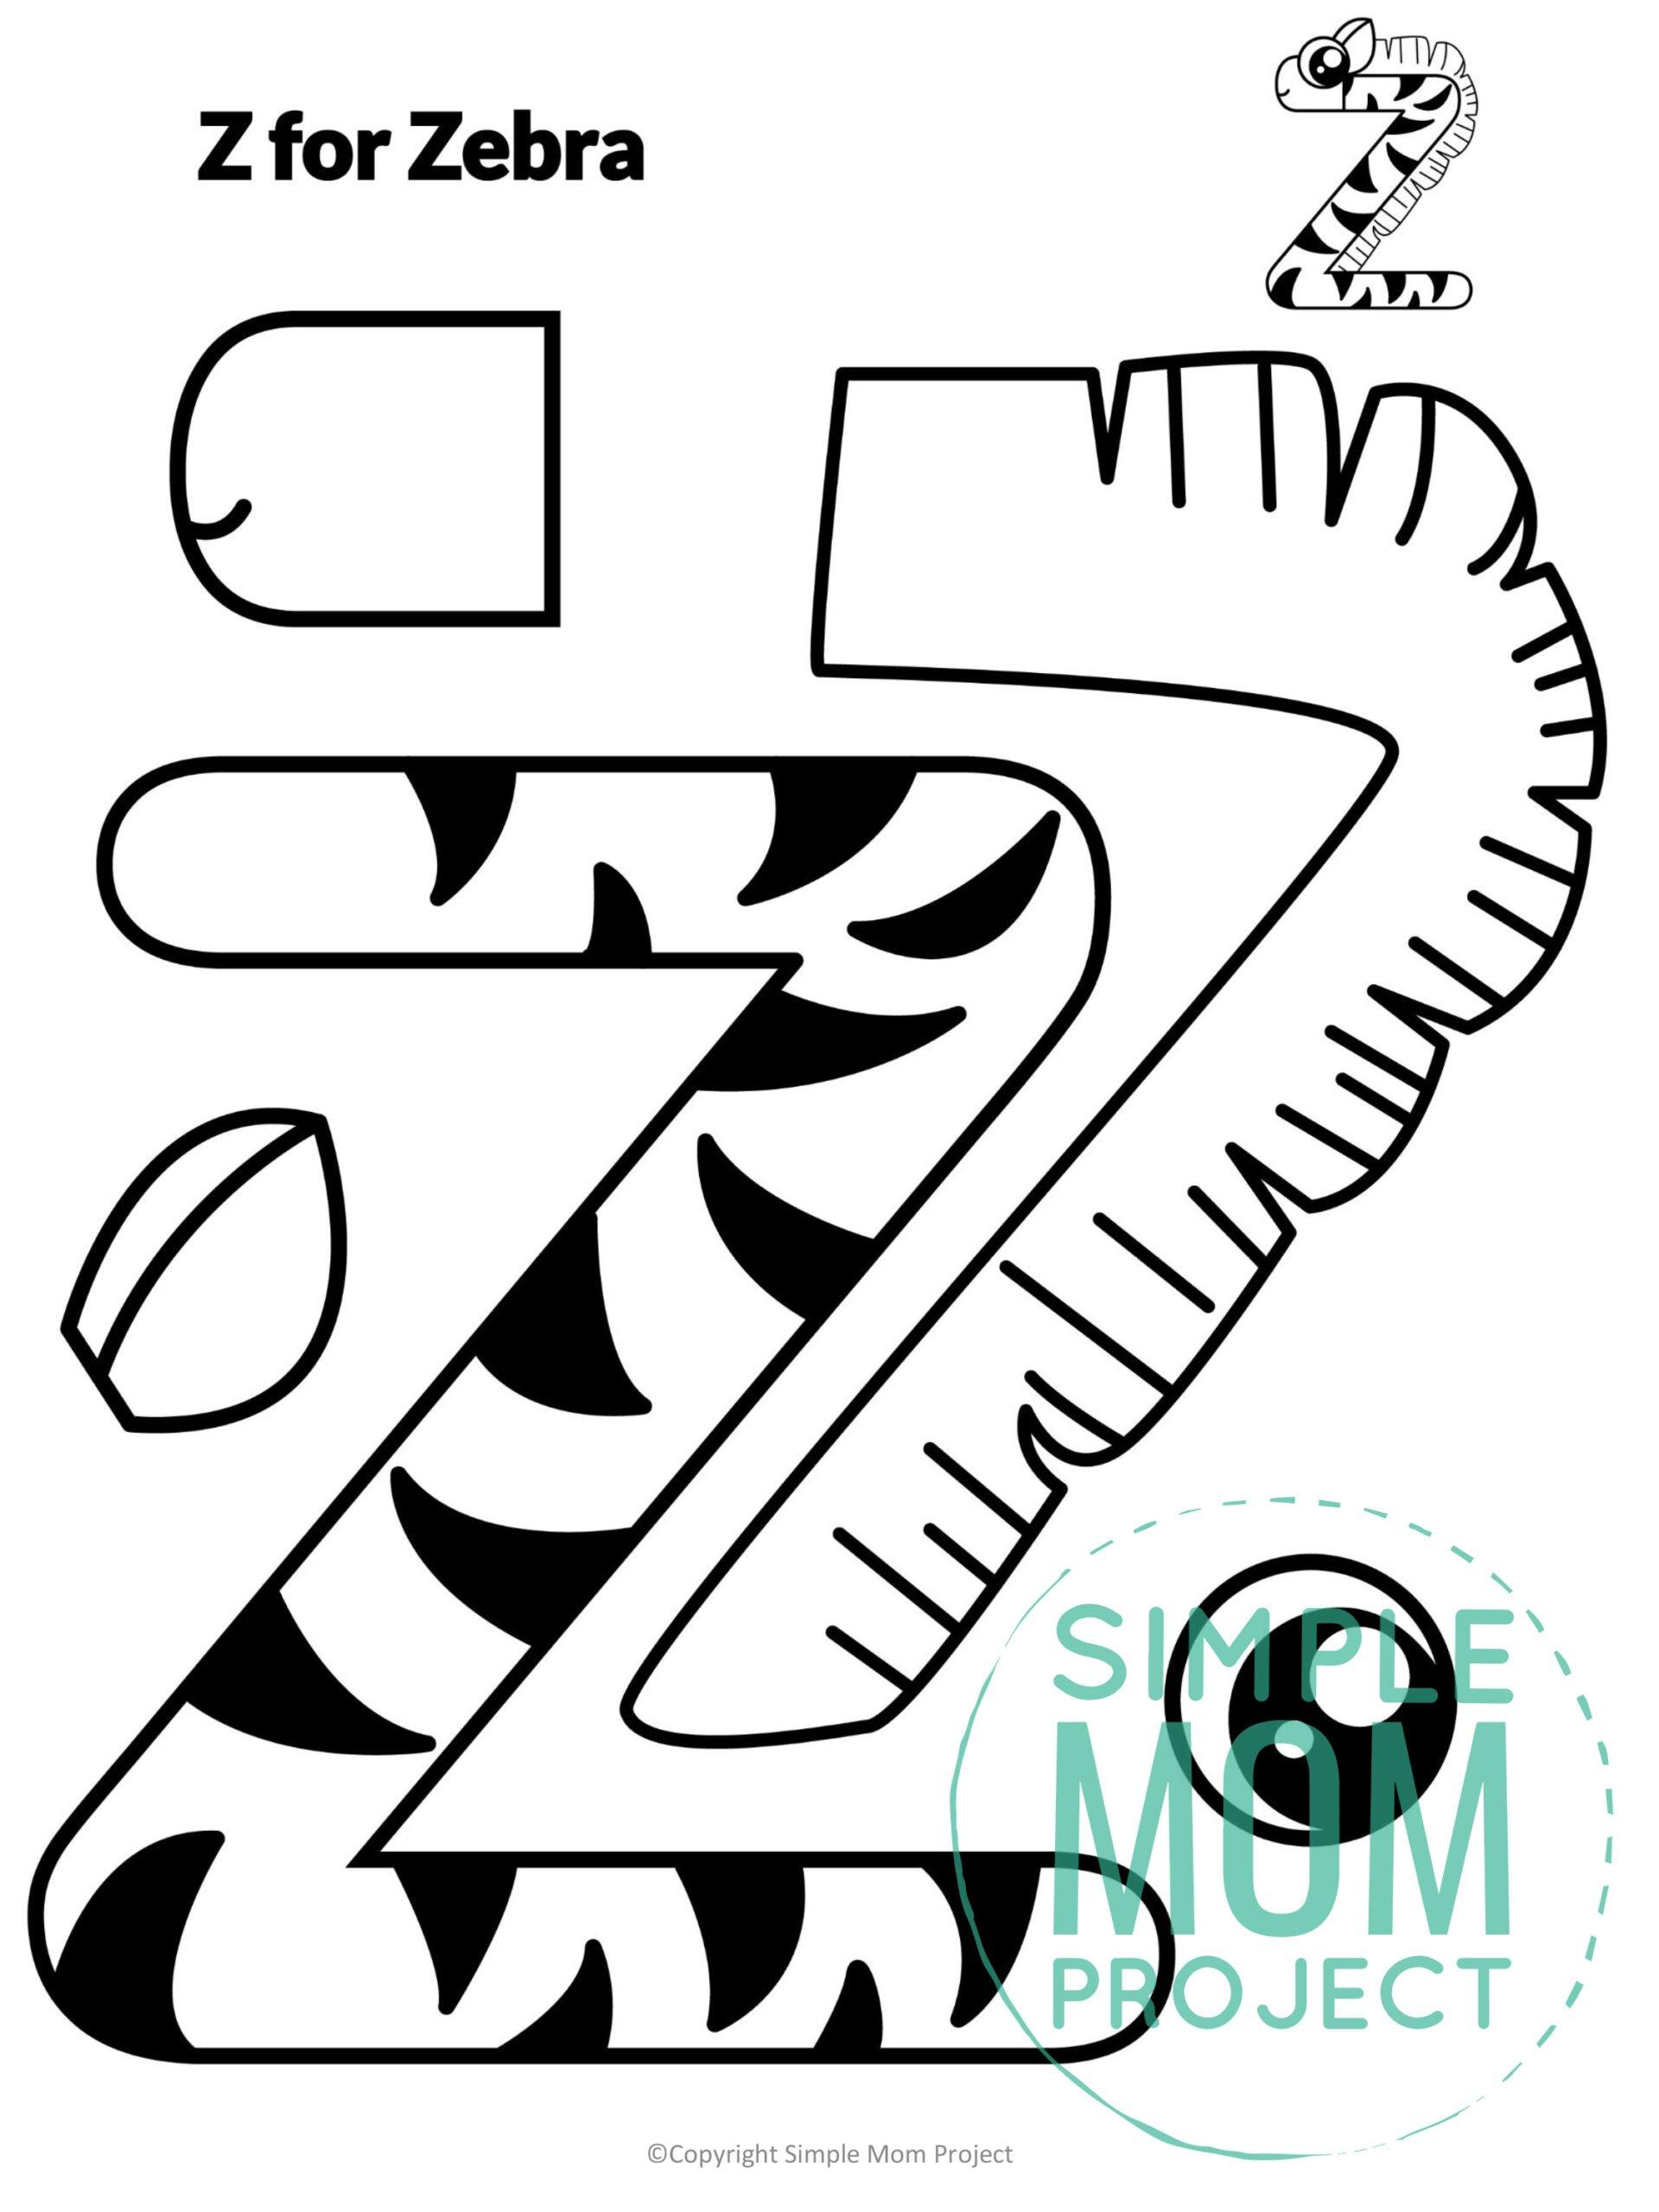 Z is for Zebra Printable Craft Zebra Letter Z Craft for Kids, preschoolers, toddlers and kindergartners